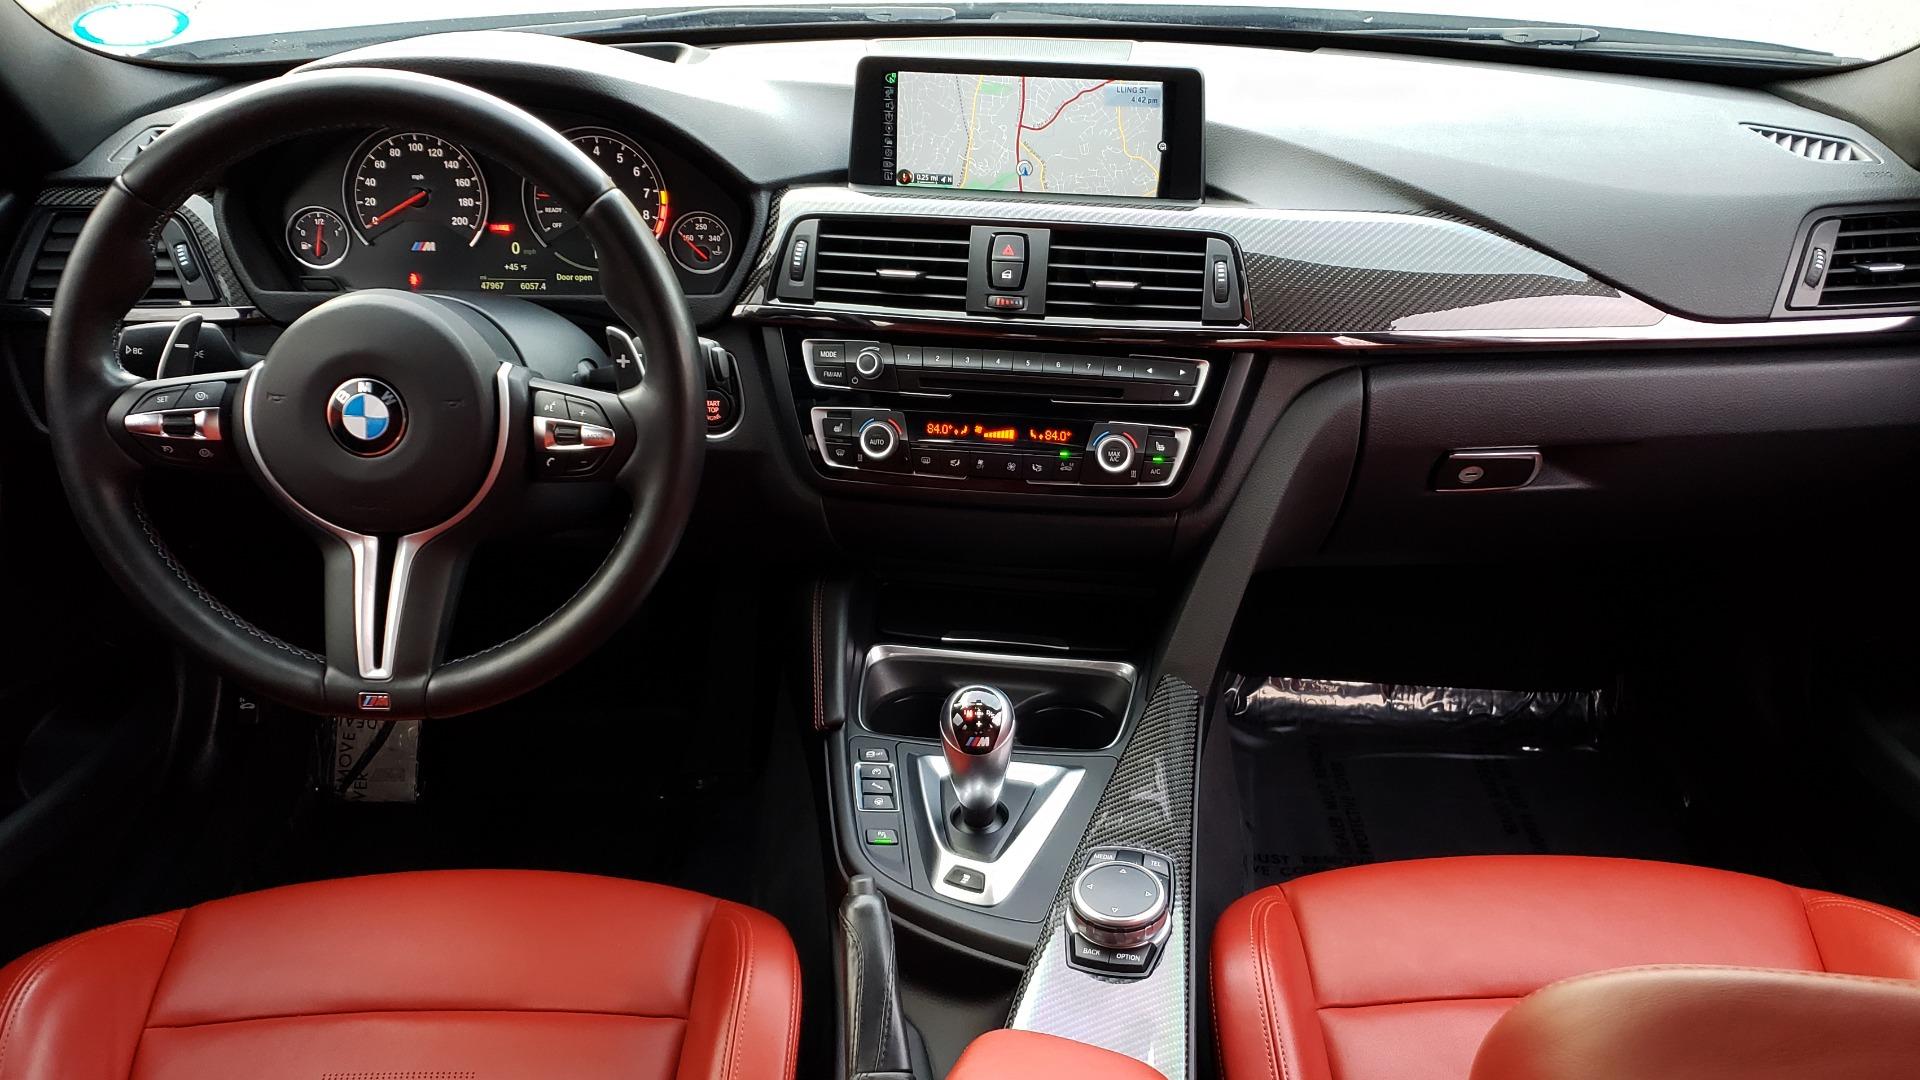 Used 2015 BMW M3 EXECUTIVE PKG / NAV / CAMERA / HUD / CARBON FIBER ROOF for sale Sold at Formula Imports in Charlotte NC 28227 87